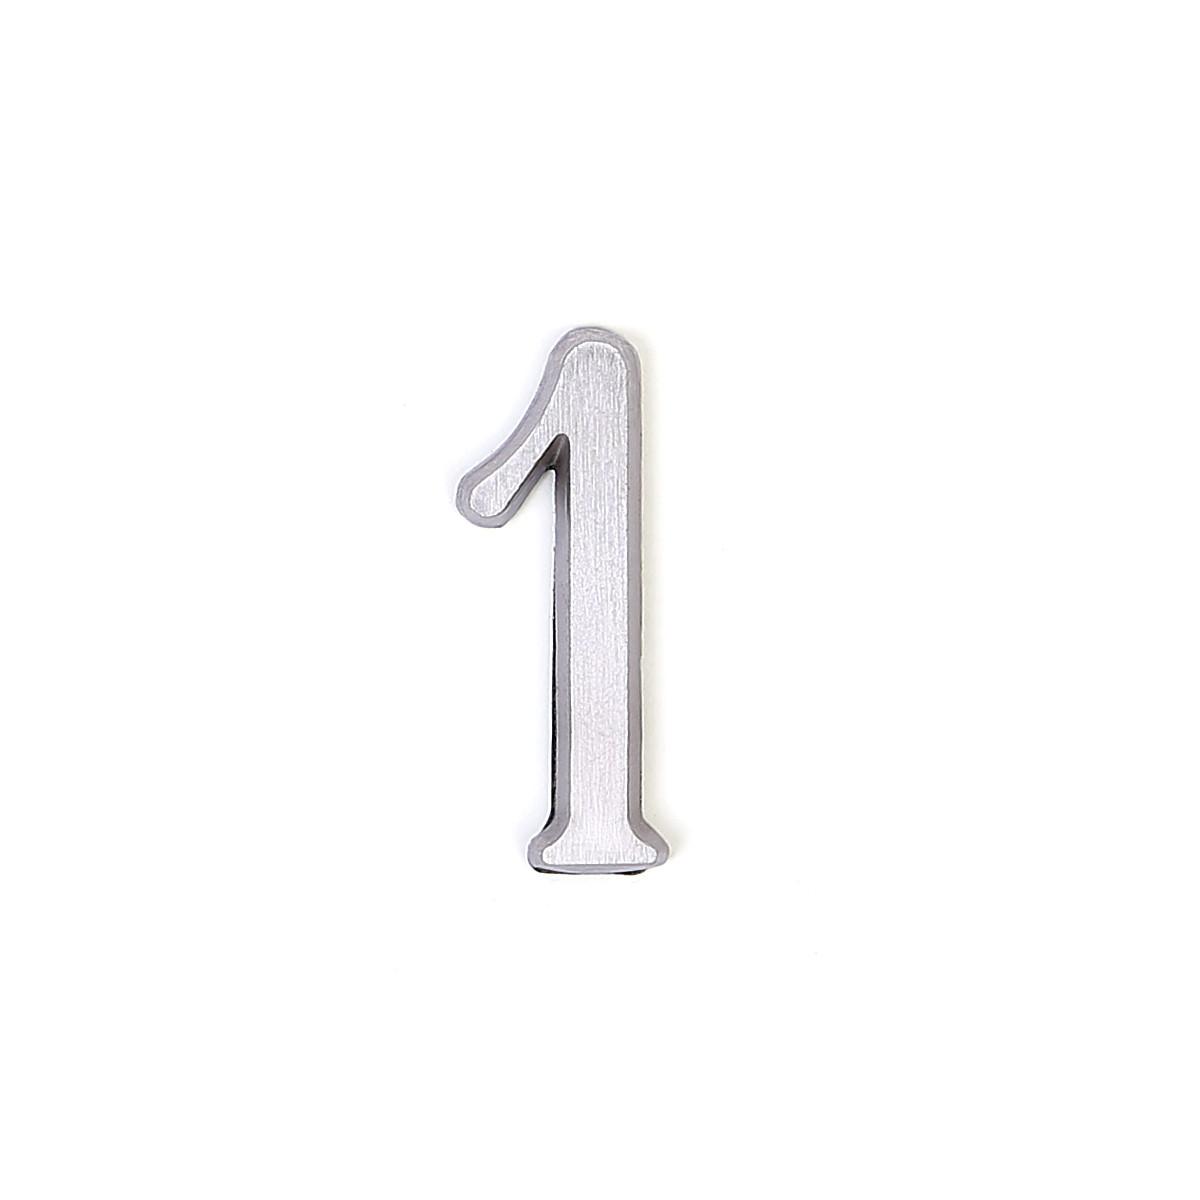 Номер из латуни на дверь Larvij цифра 1 никель (LNB5 BLN#1)